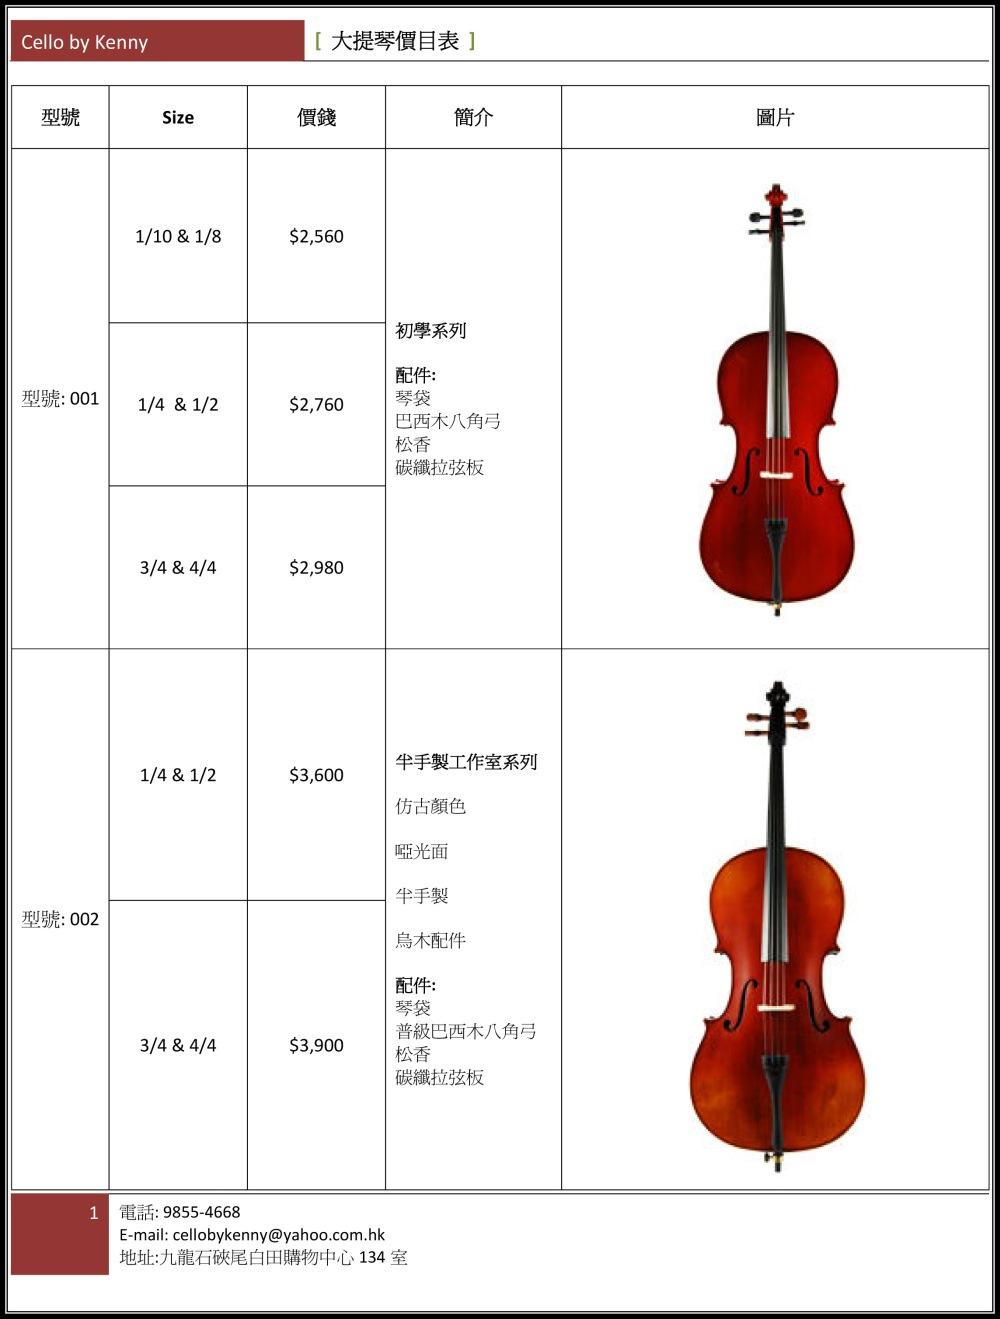 Cello price list-1